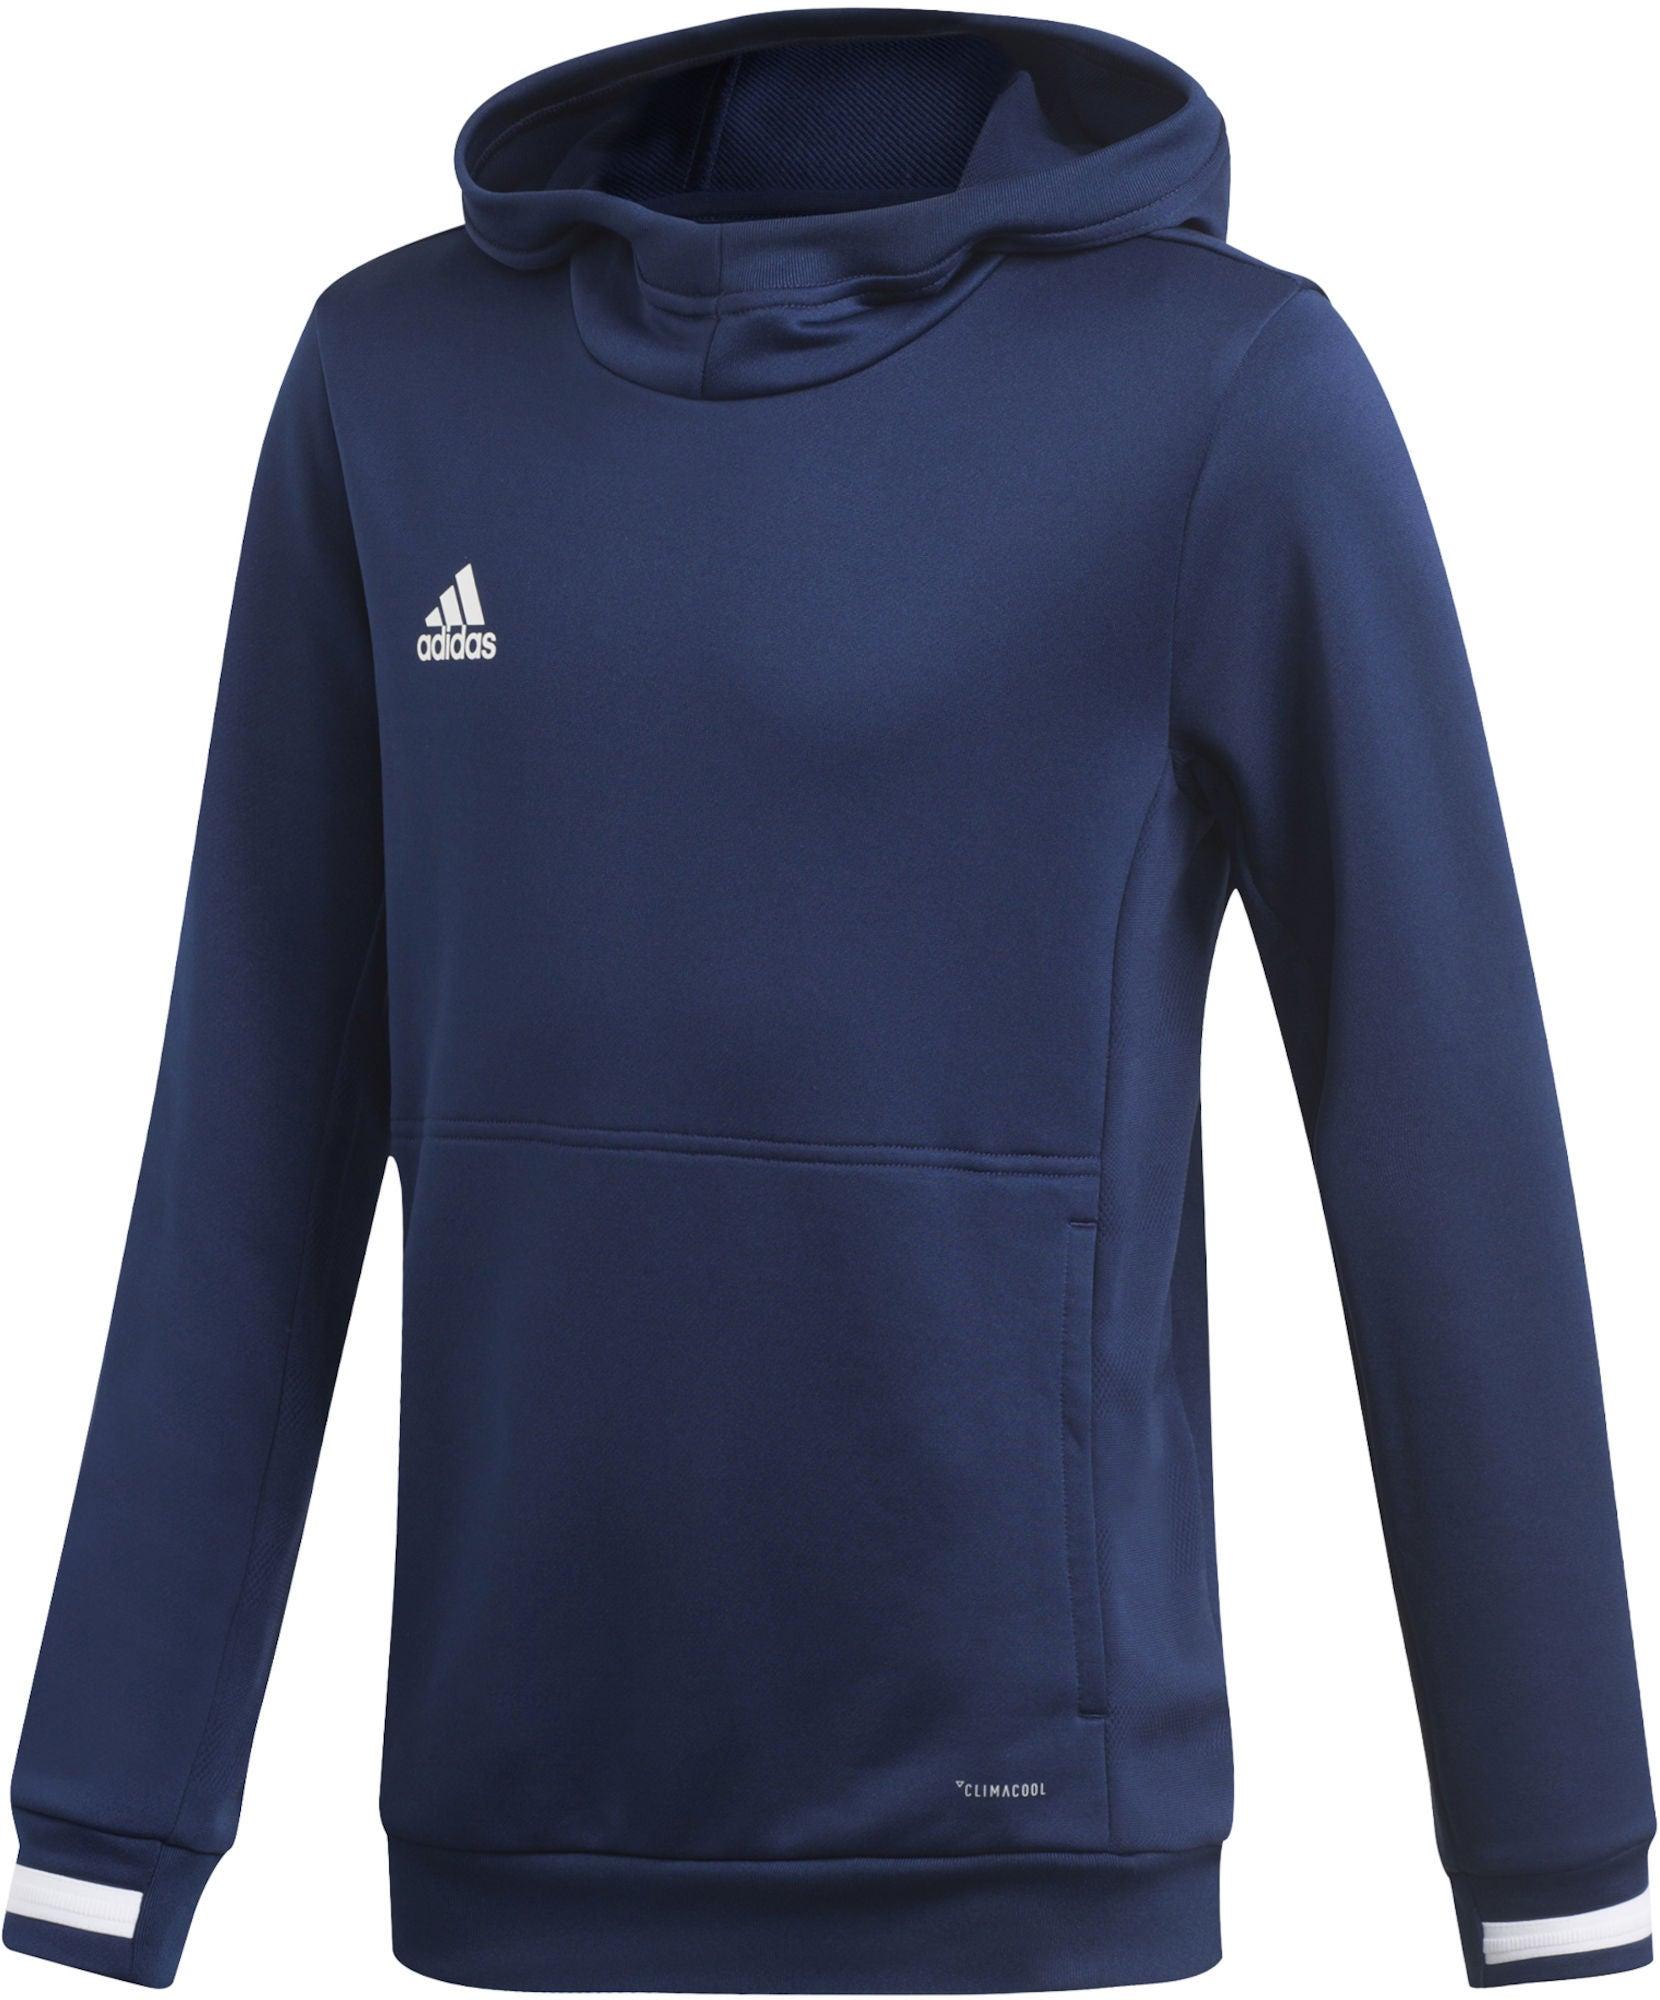 Kjøp Adidas Solecourt Sko, Svart   Jollyroom